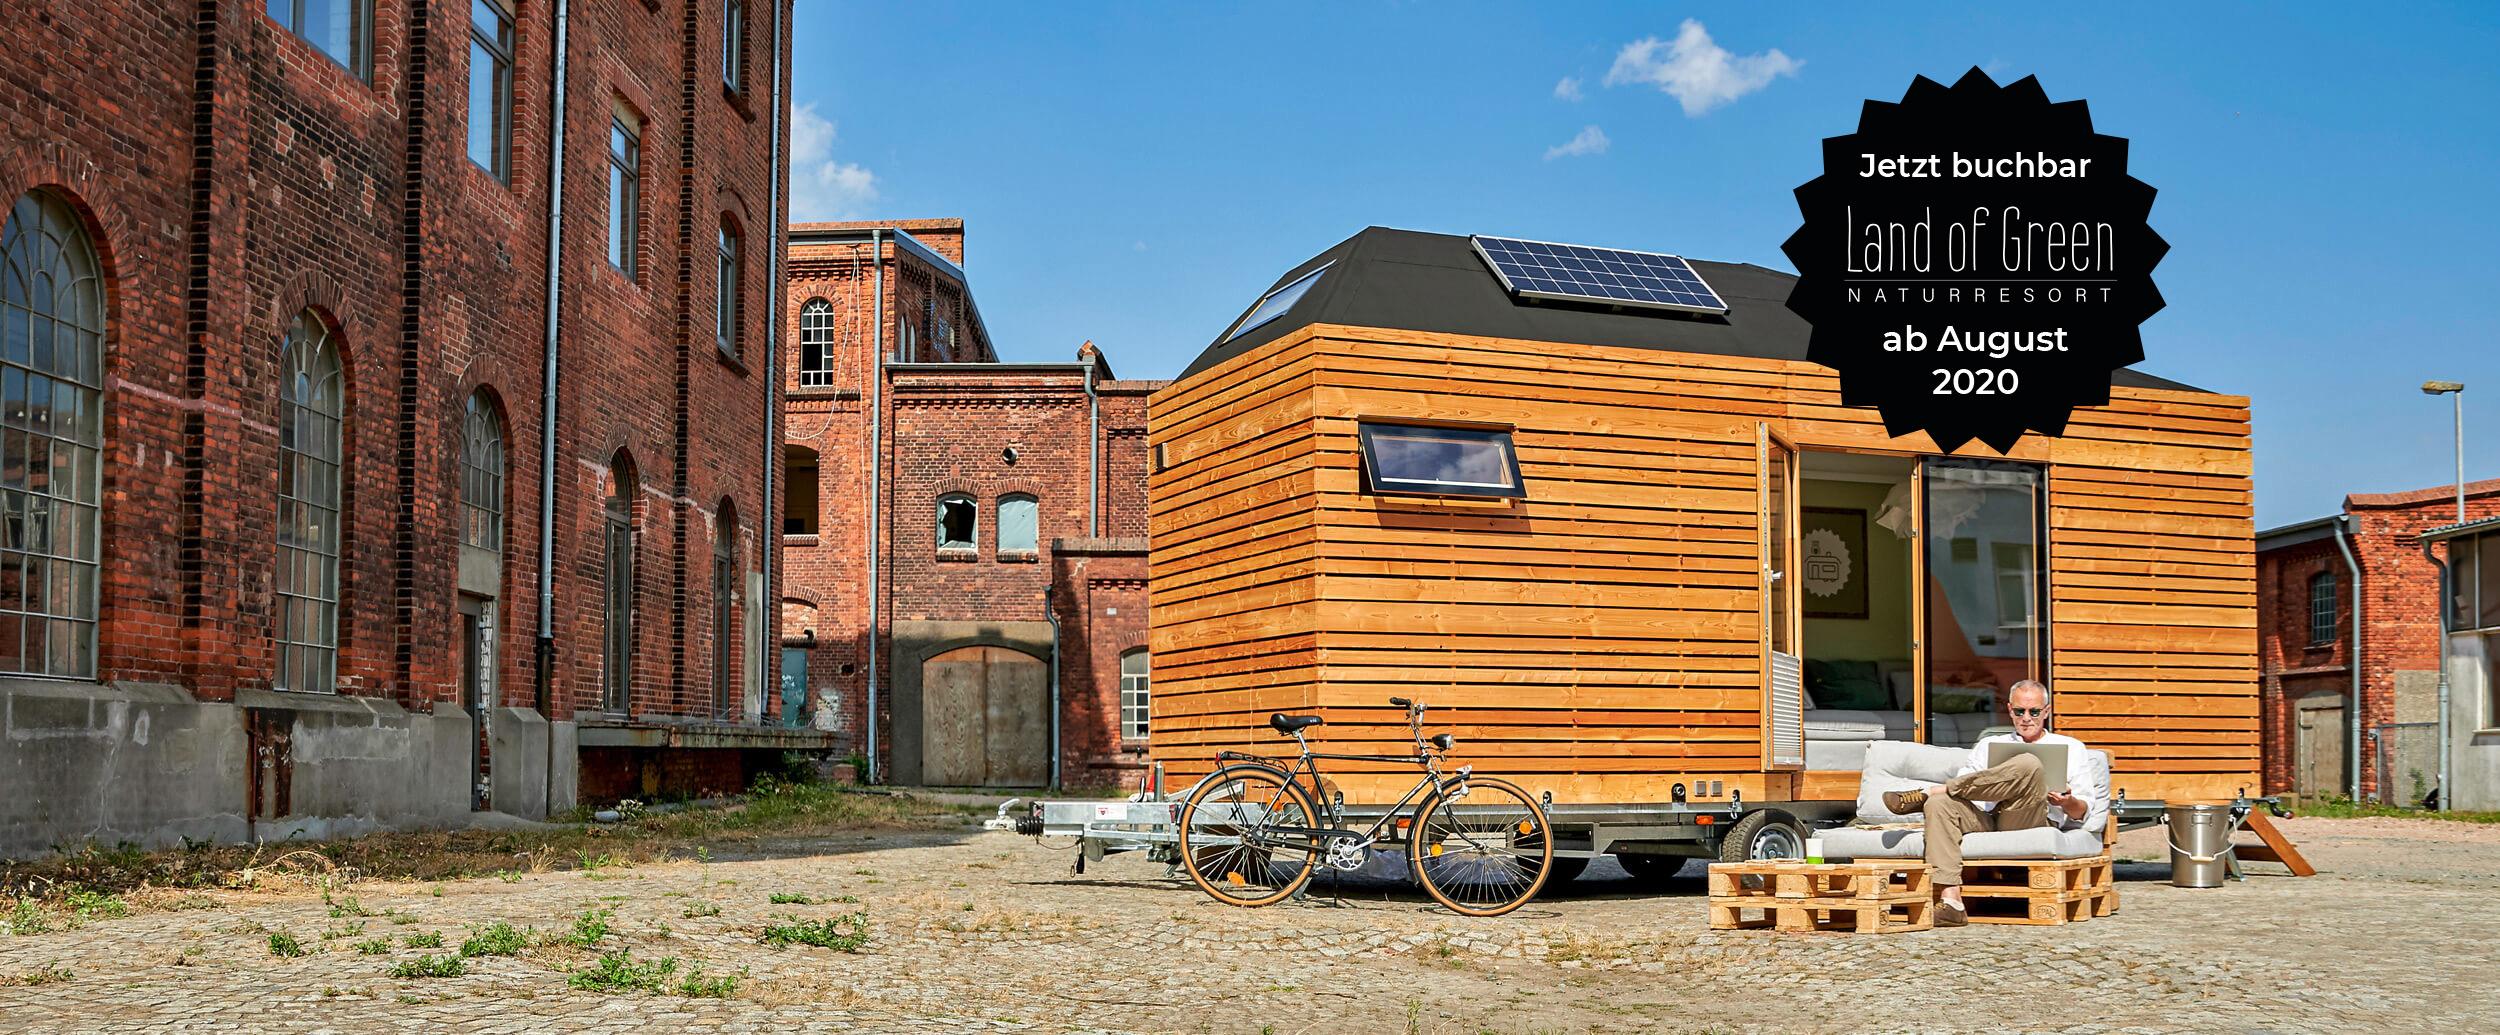 Aufgebautes Tinyhouse in urbaner Umgebung